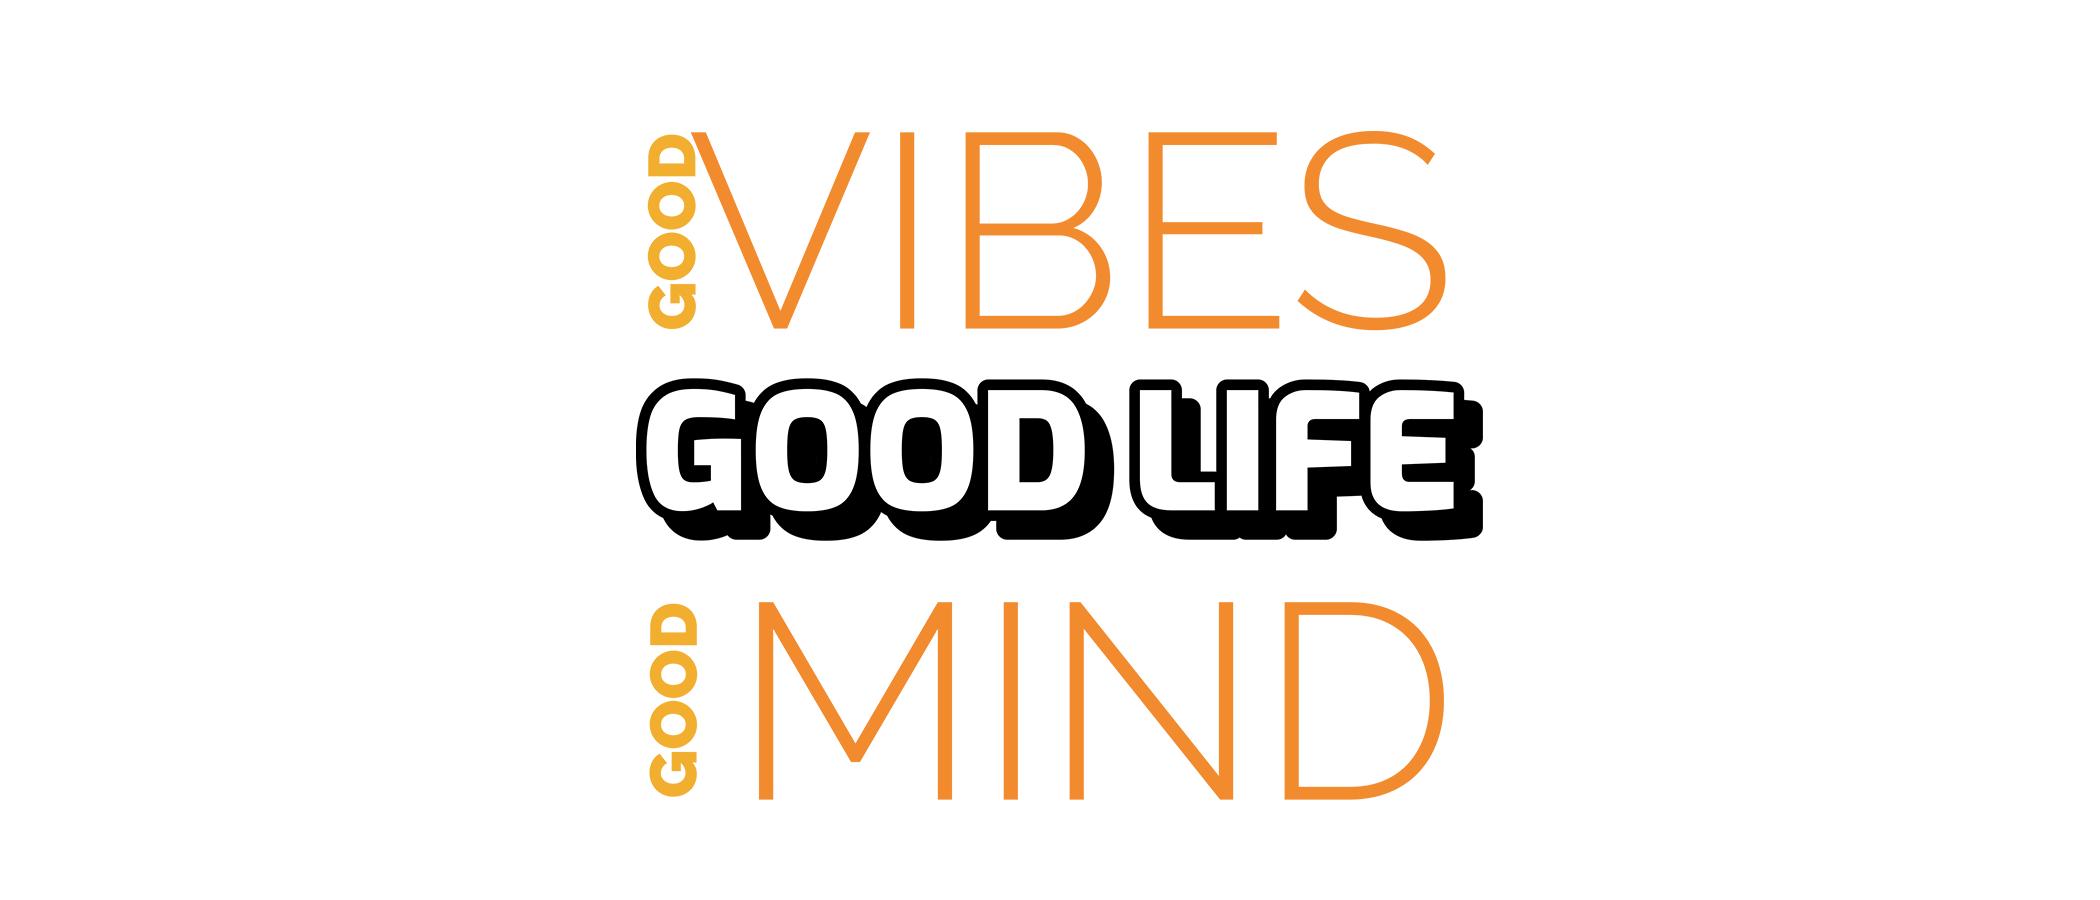 Just Good Living